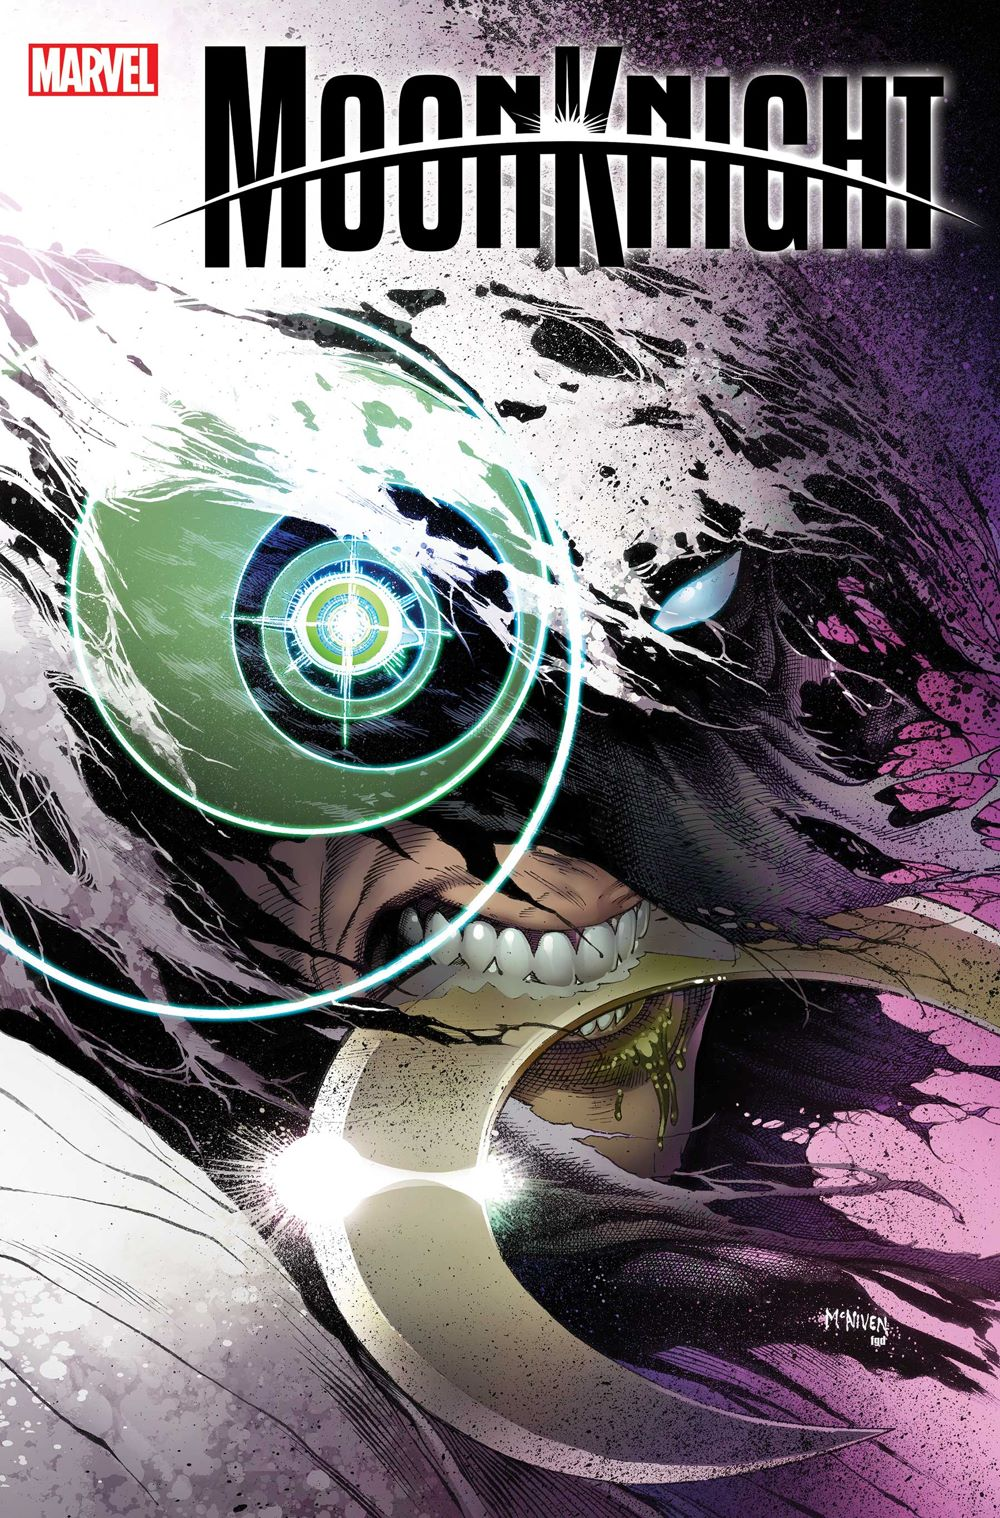 MOONKN2021002_Cov Marvel Comics August 2021 Solicitations